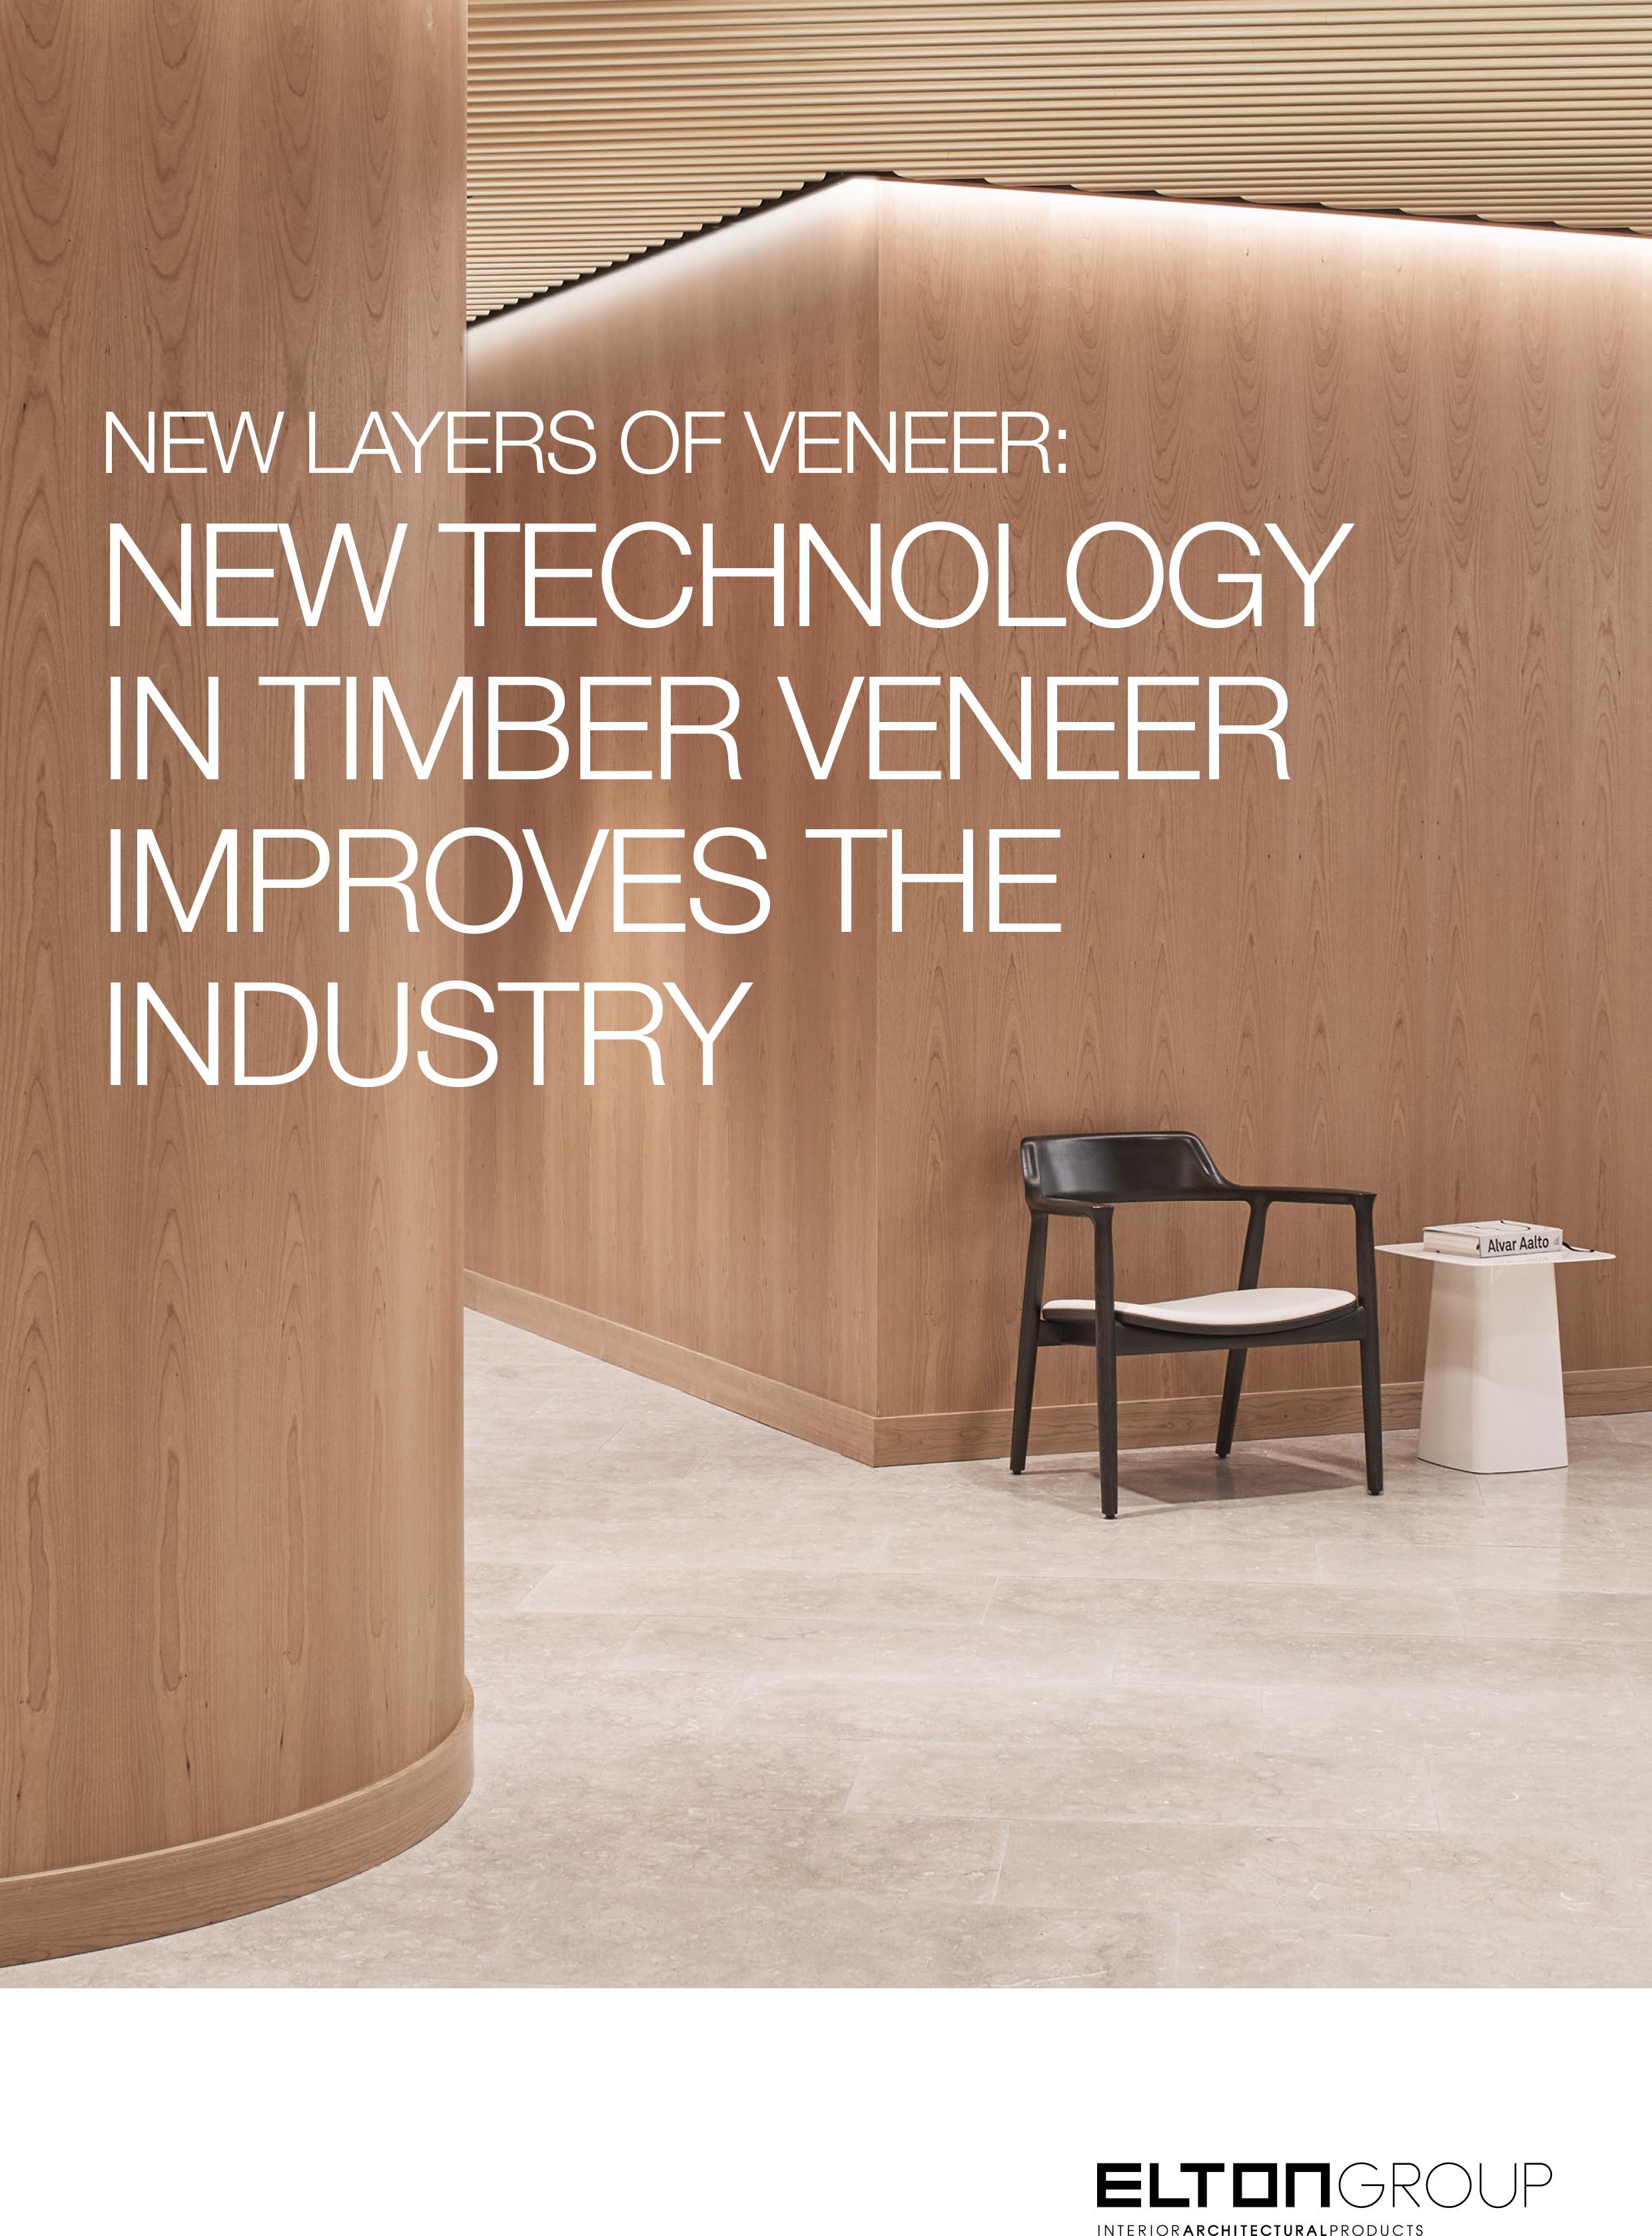 New Layers Of Veneer New Technology In Timber Veneer